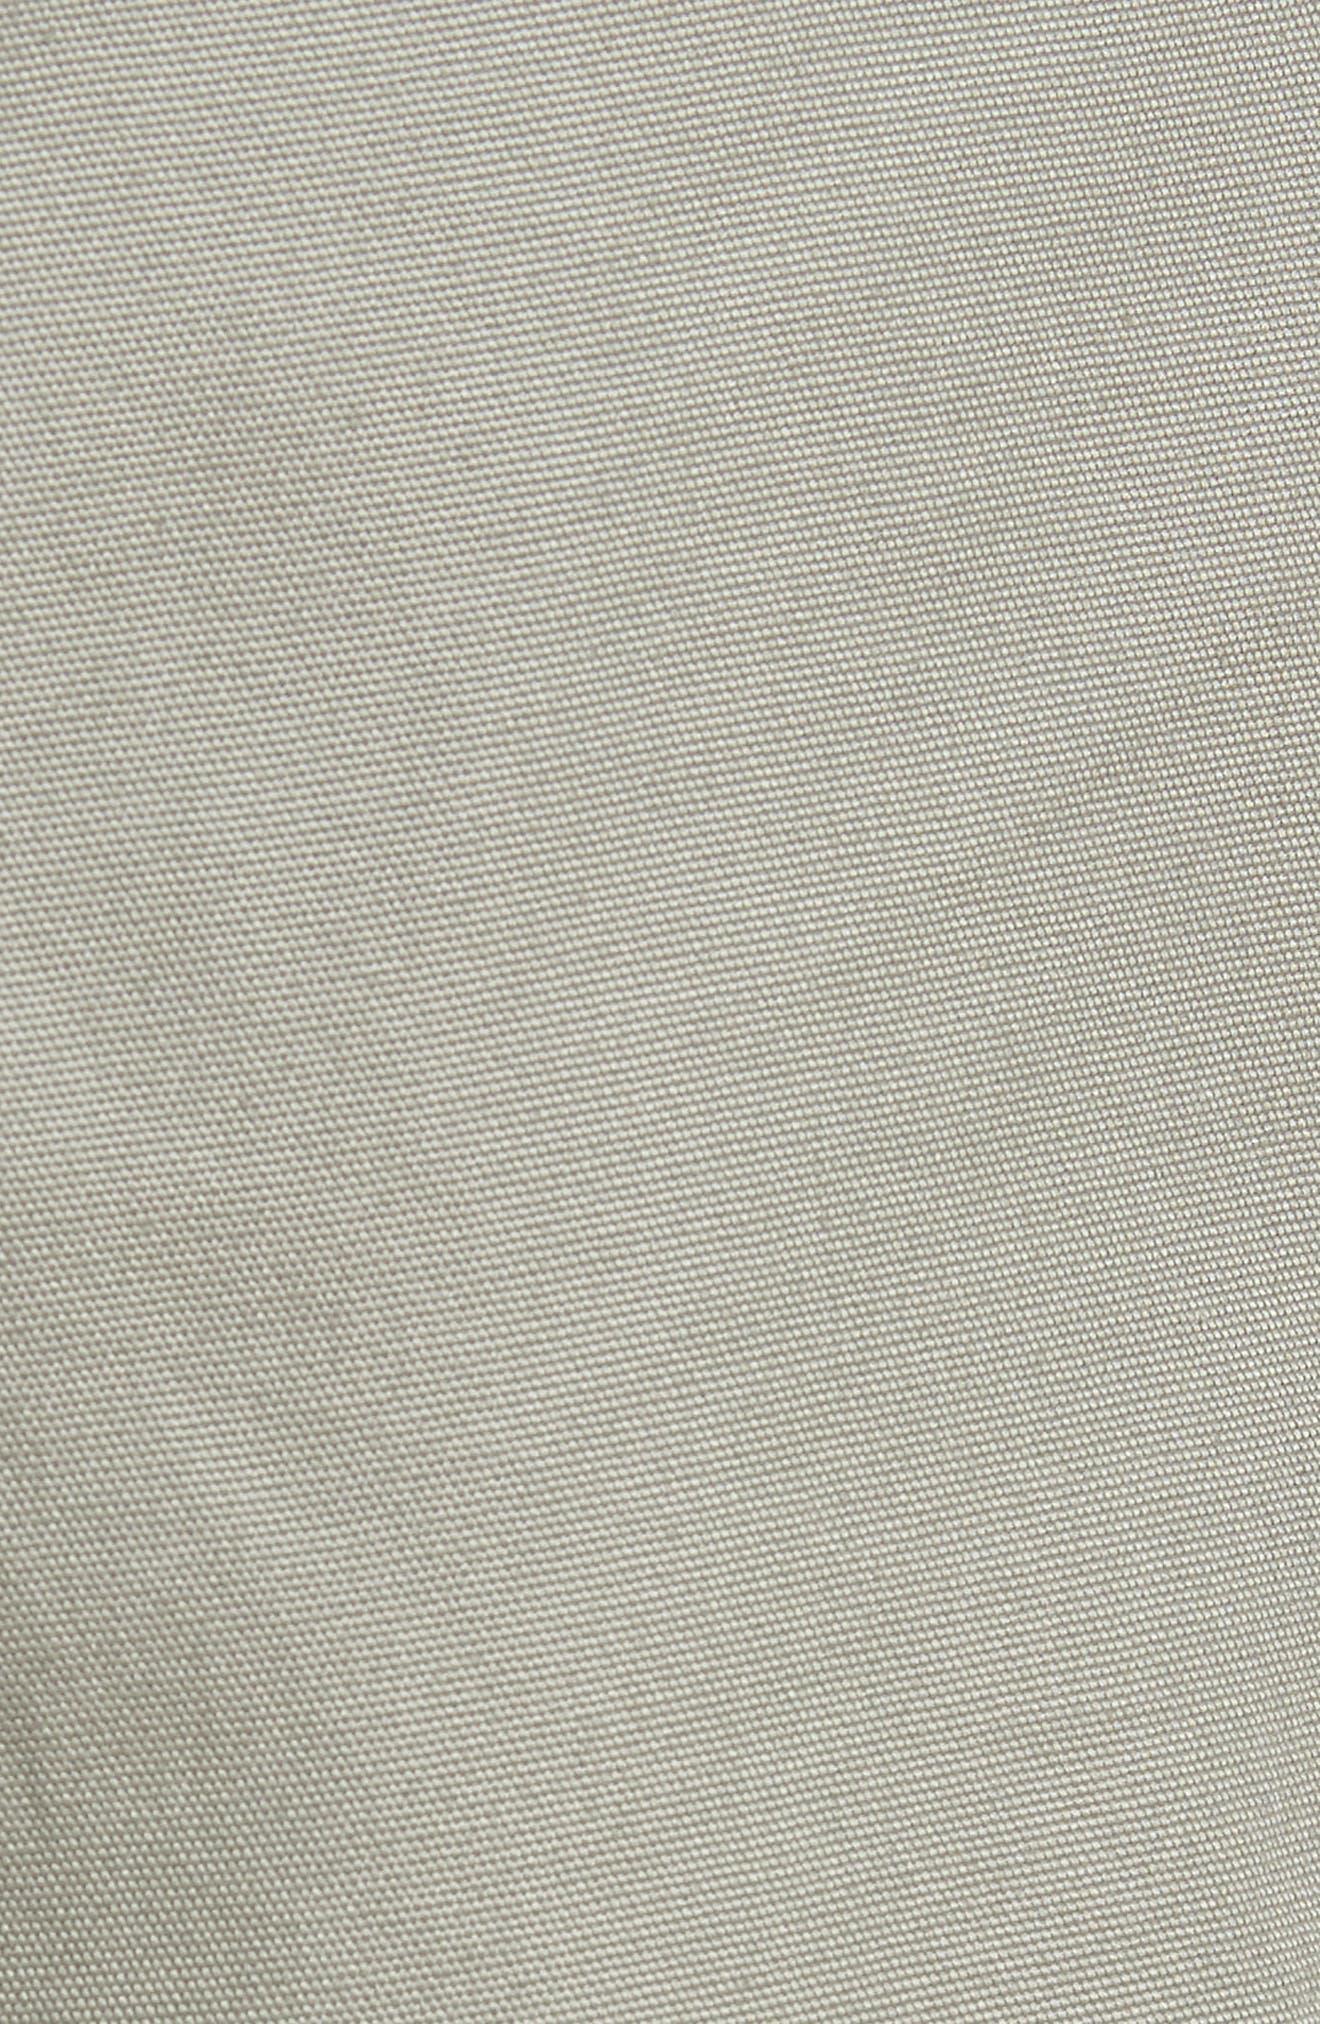 Marsh Cargo Shorts,                             Alternate thumbnail 5, color,                             004